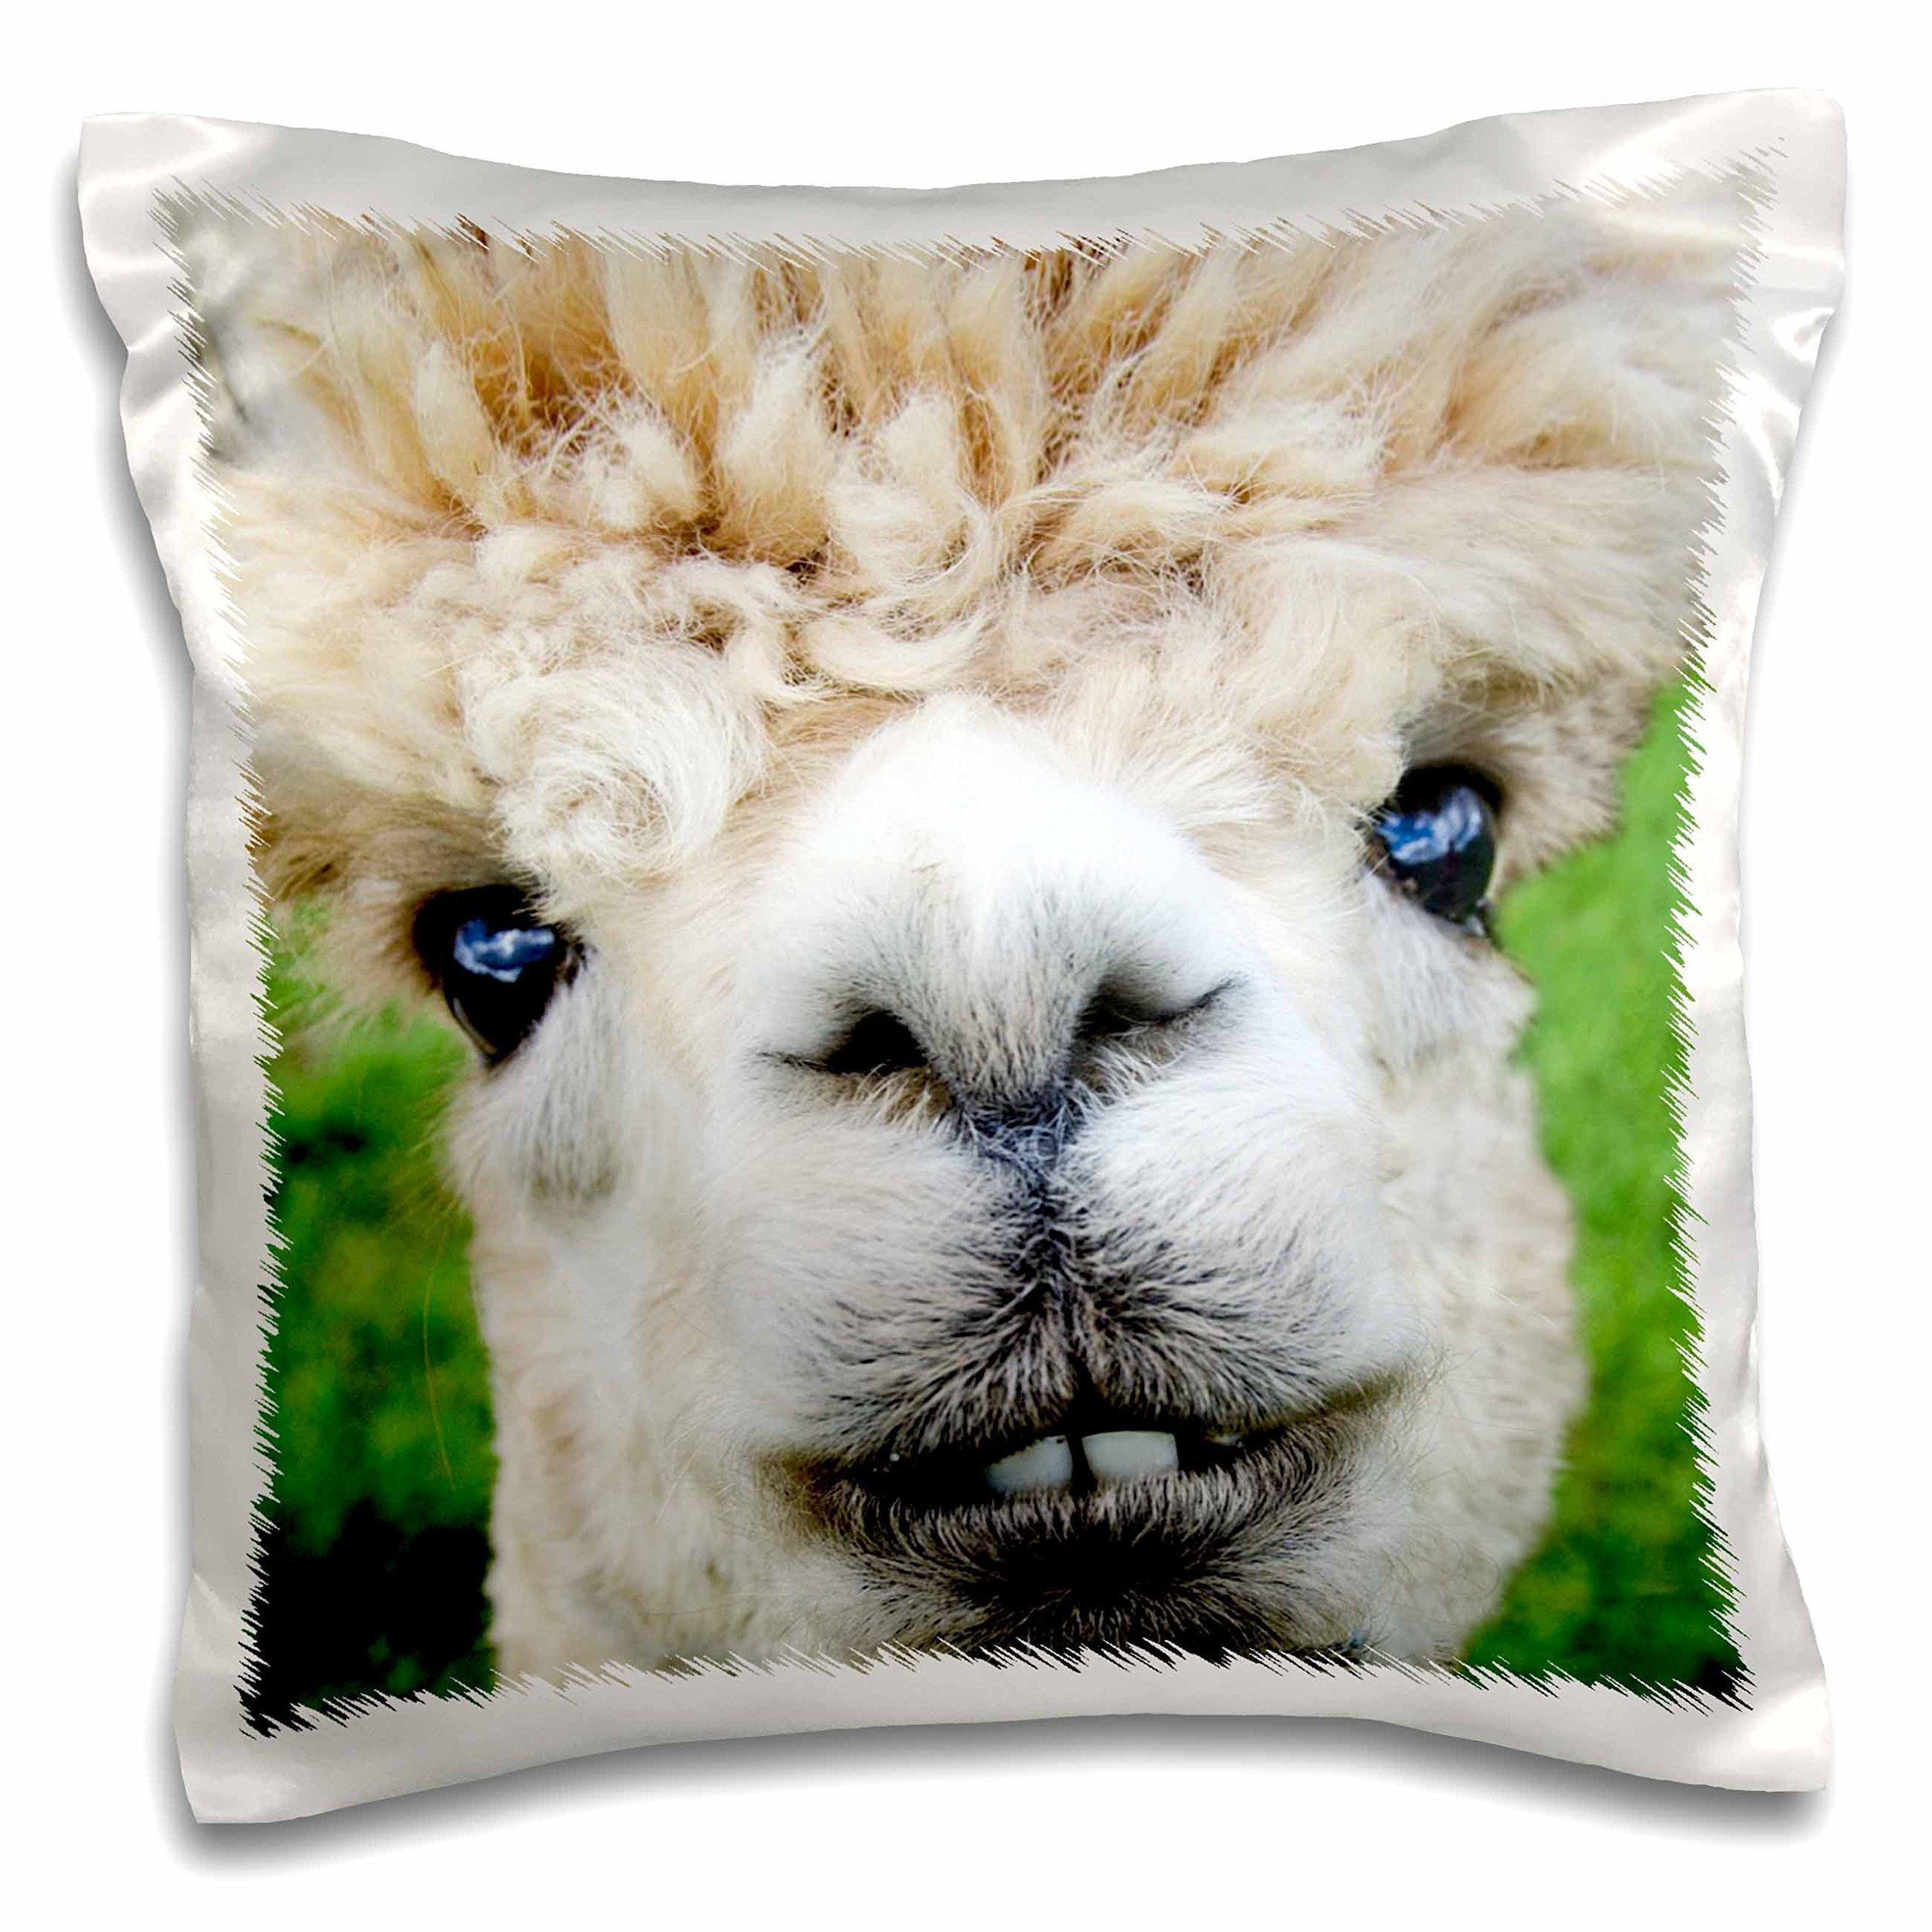 3D Rose Alpaca Lama South America White Pillow Case, 16'' x 16''